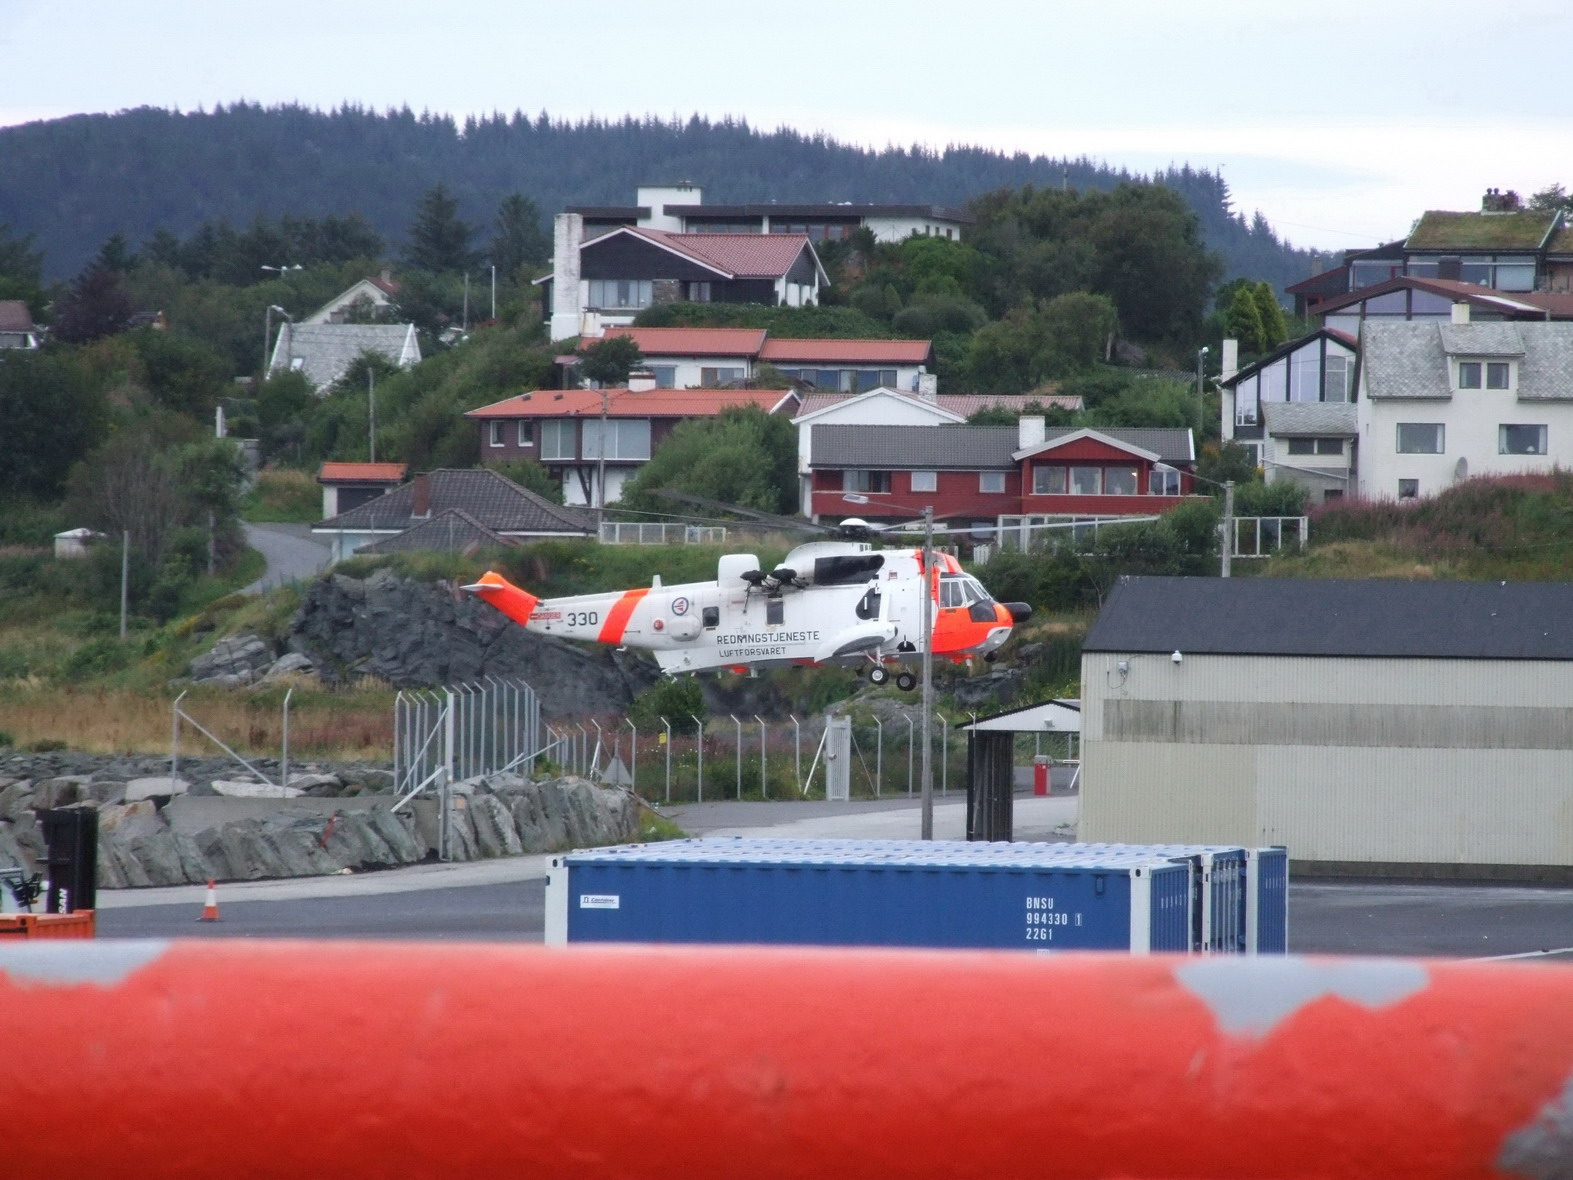 Coastguard heli07.jpg